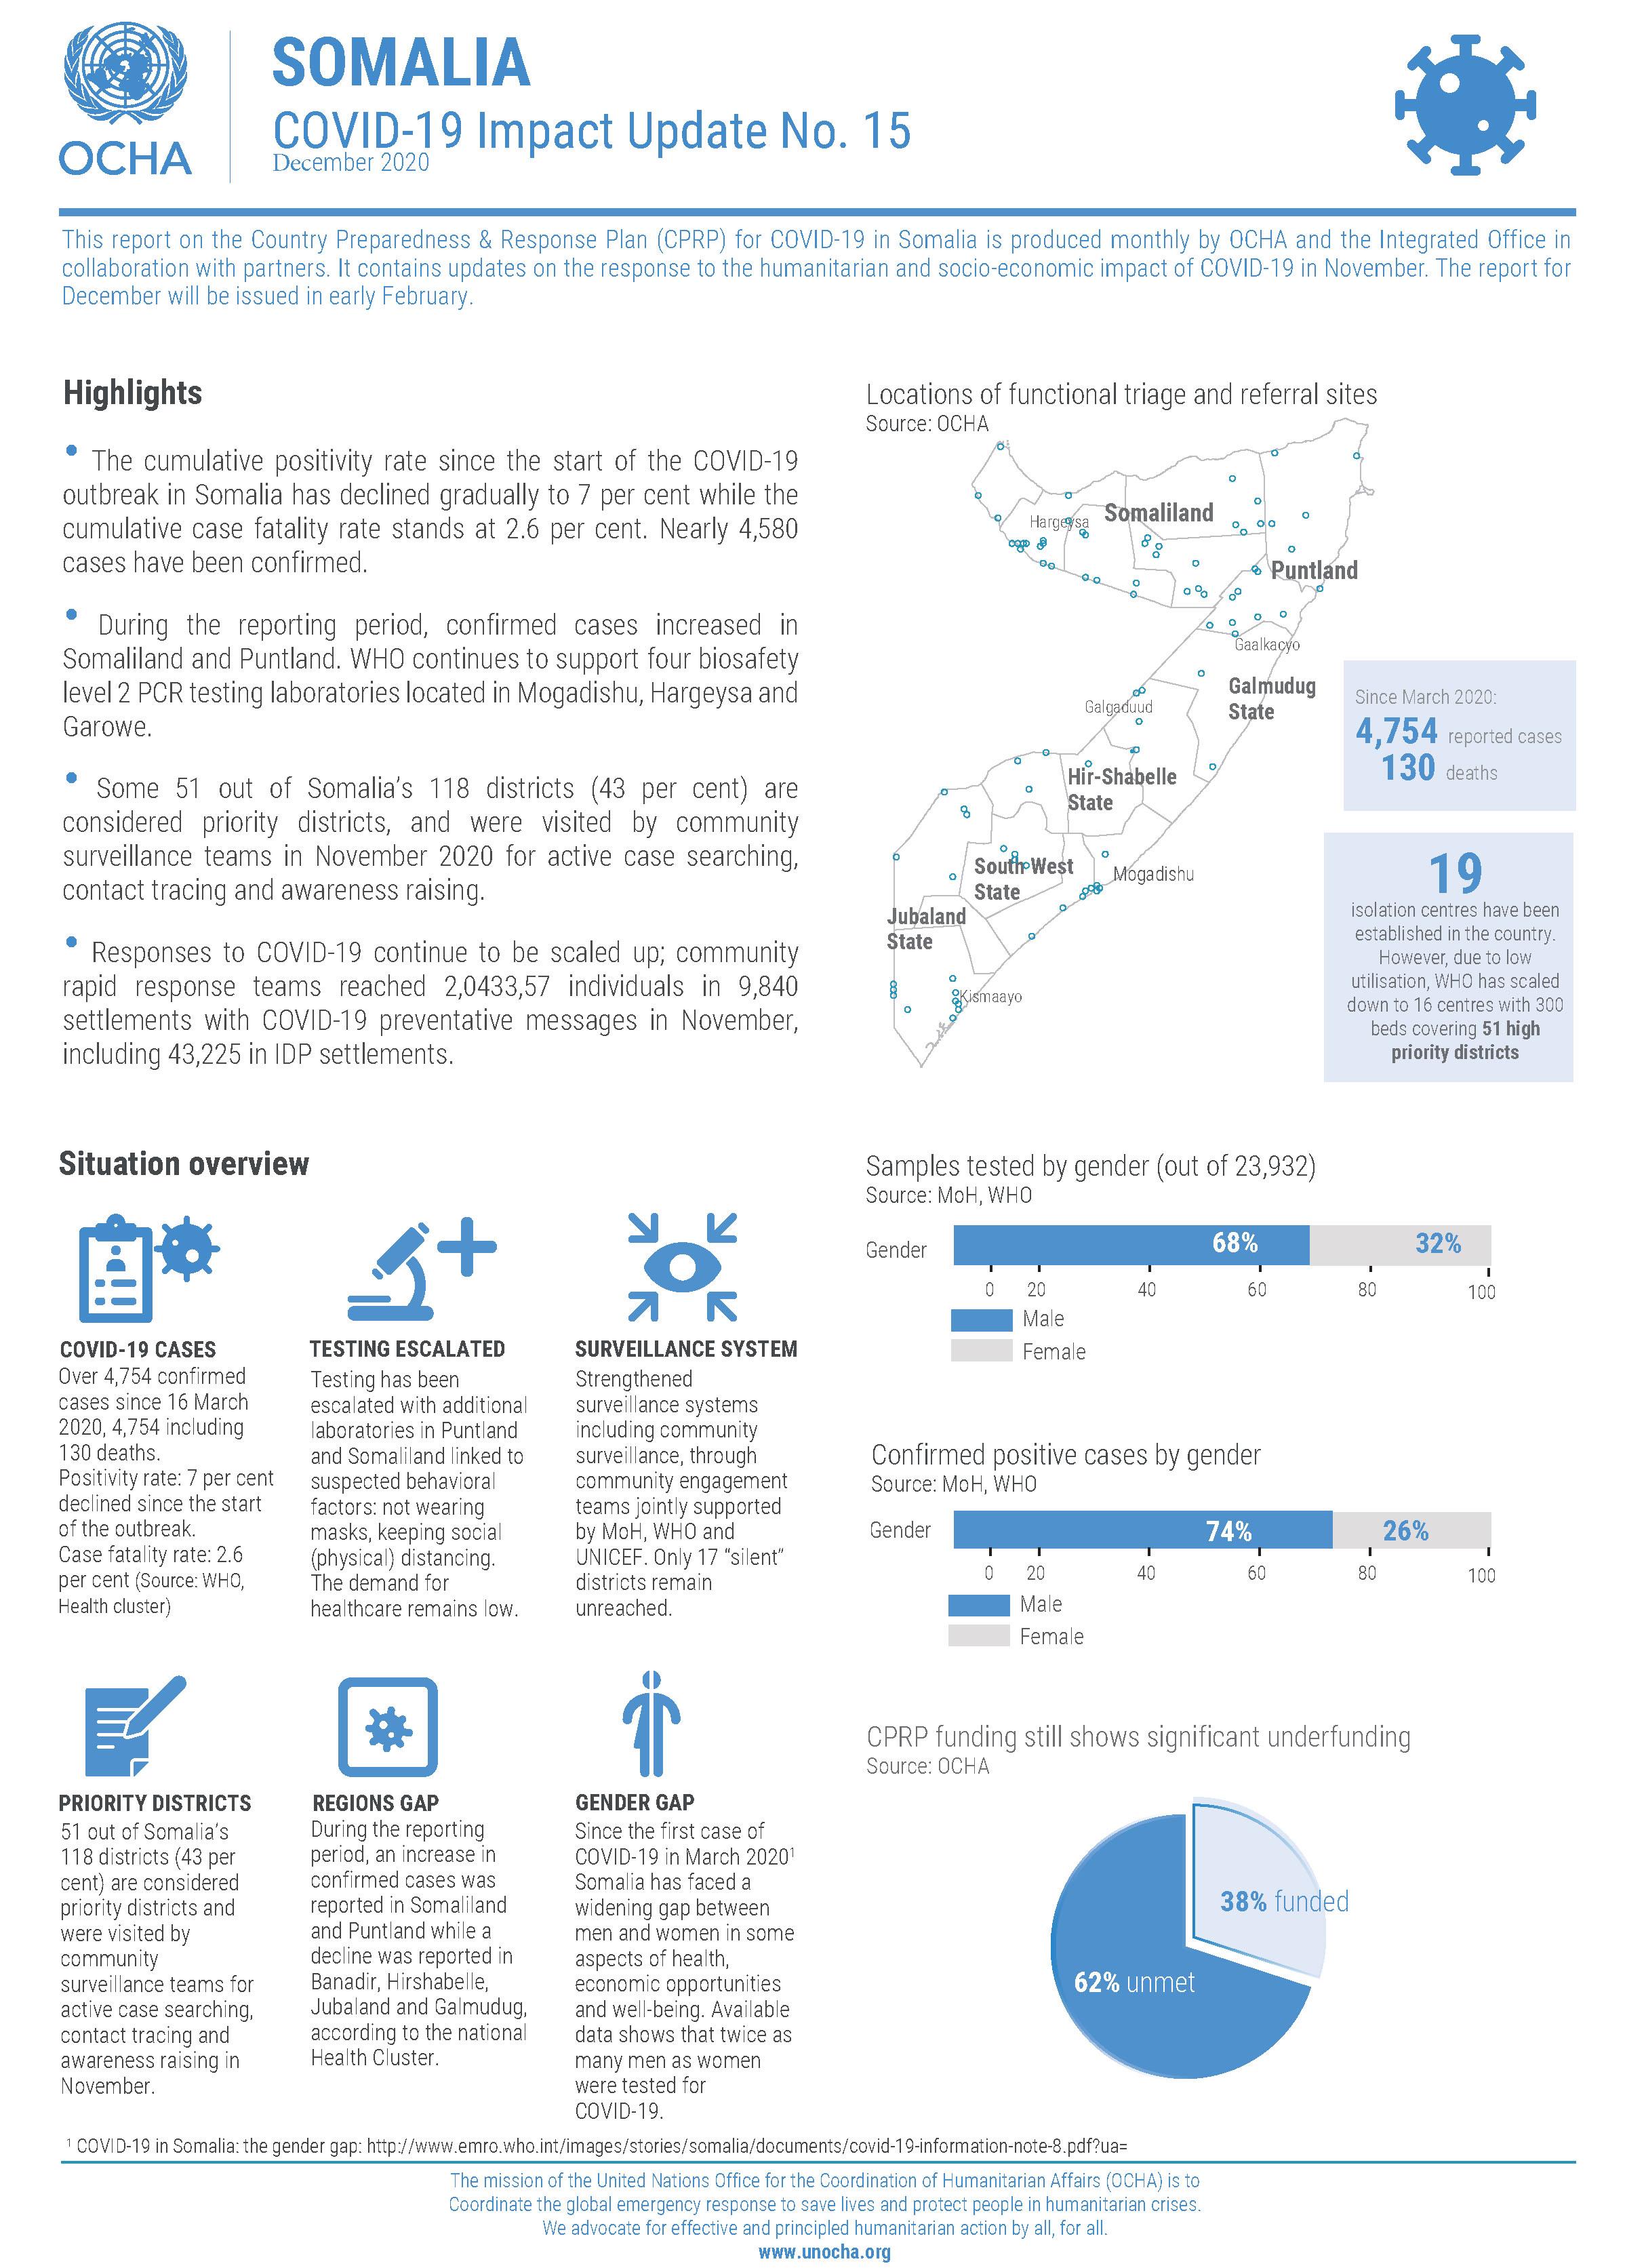 Somalia: COVID-19 Impact Update No. 15 (December 2020)